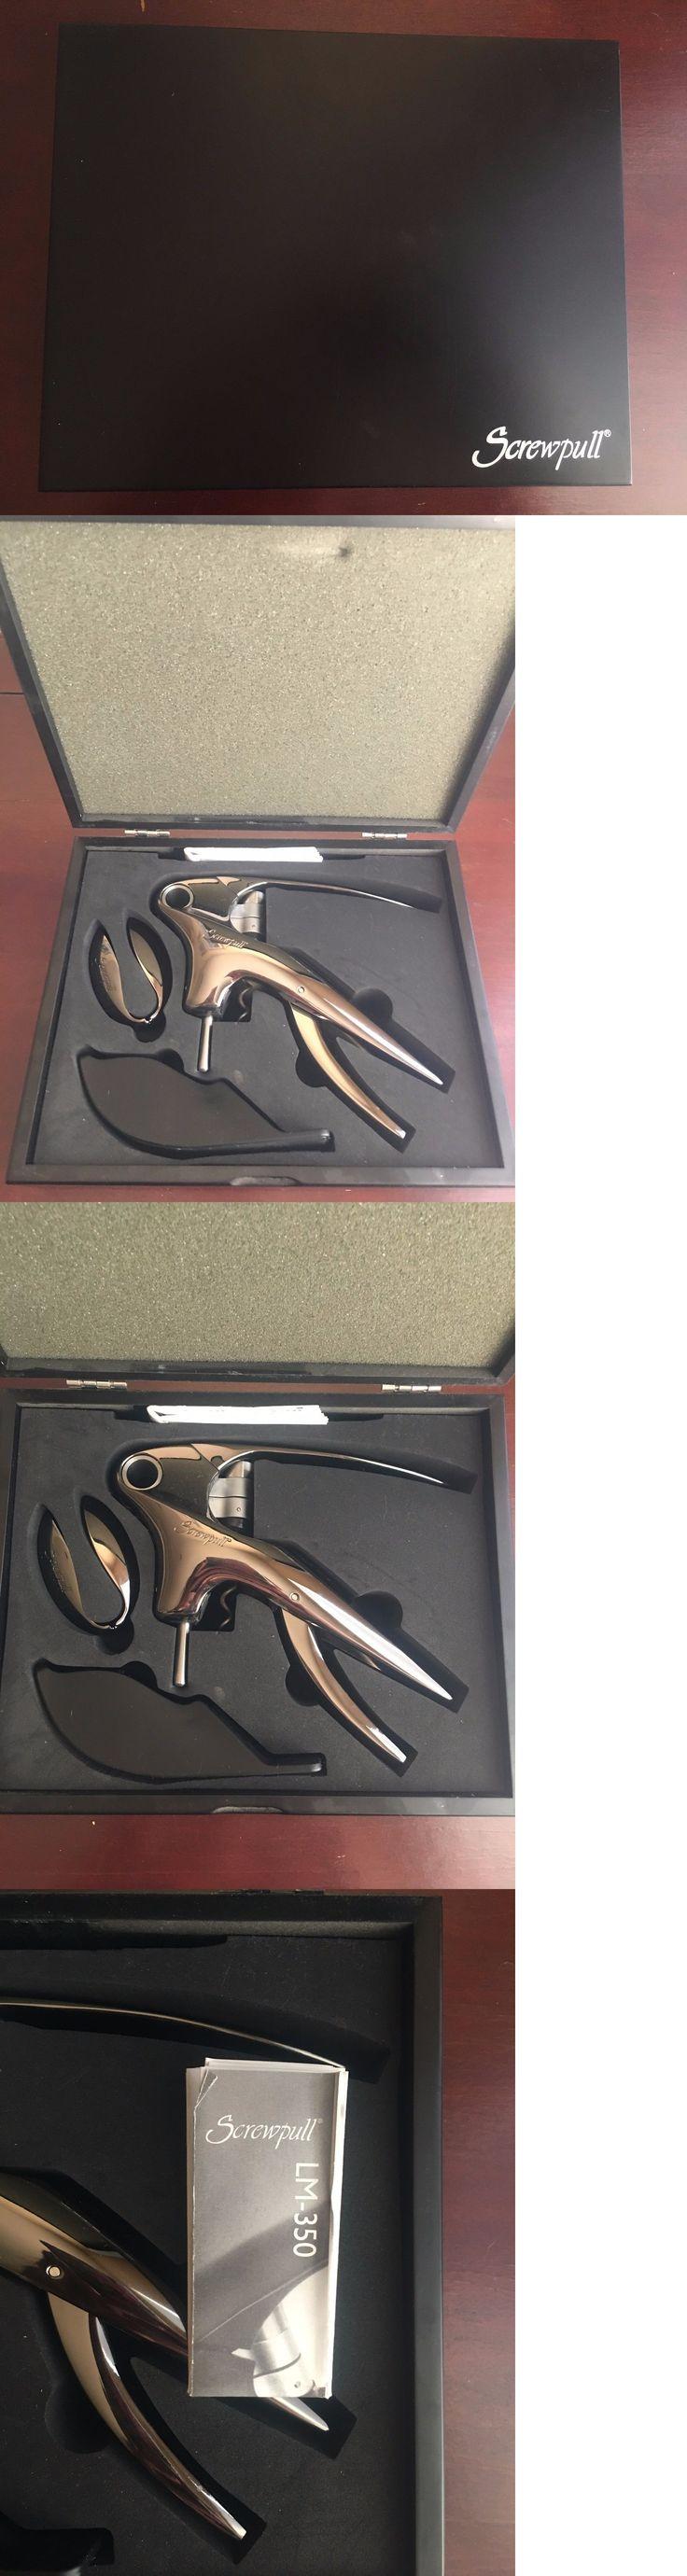 Corkscrews and Openers 20688: Screwpull Lm-350B Trigger Lever Wine Opener Set (Black Nickel) -> BUY IT NOW ONLY: $37.5 on eBay!